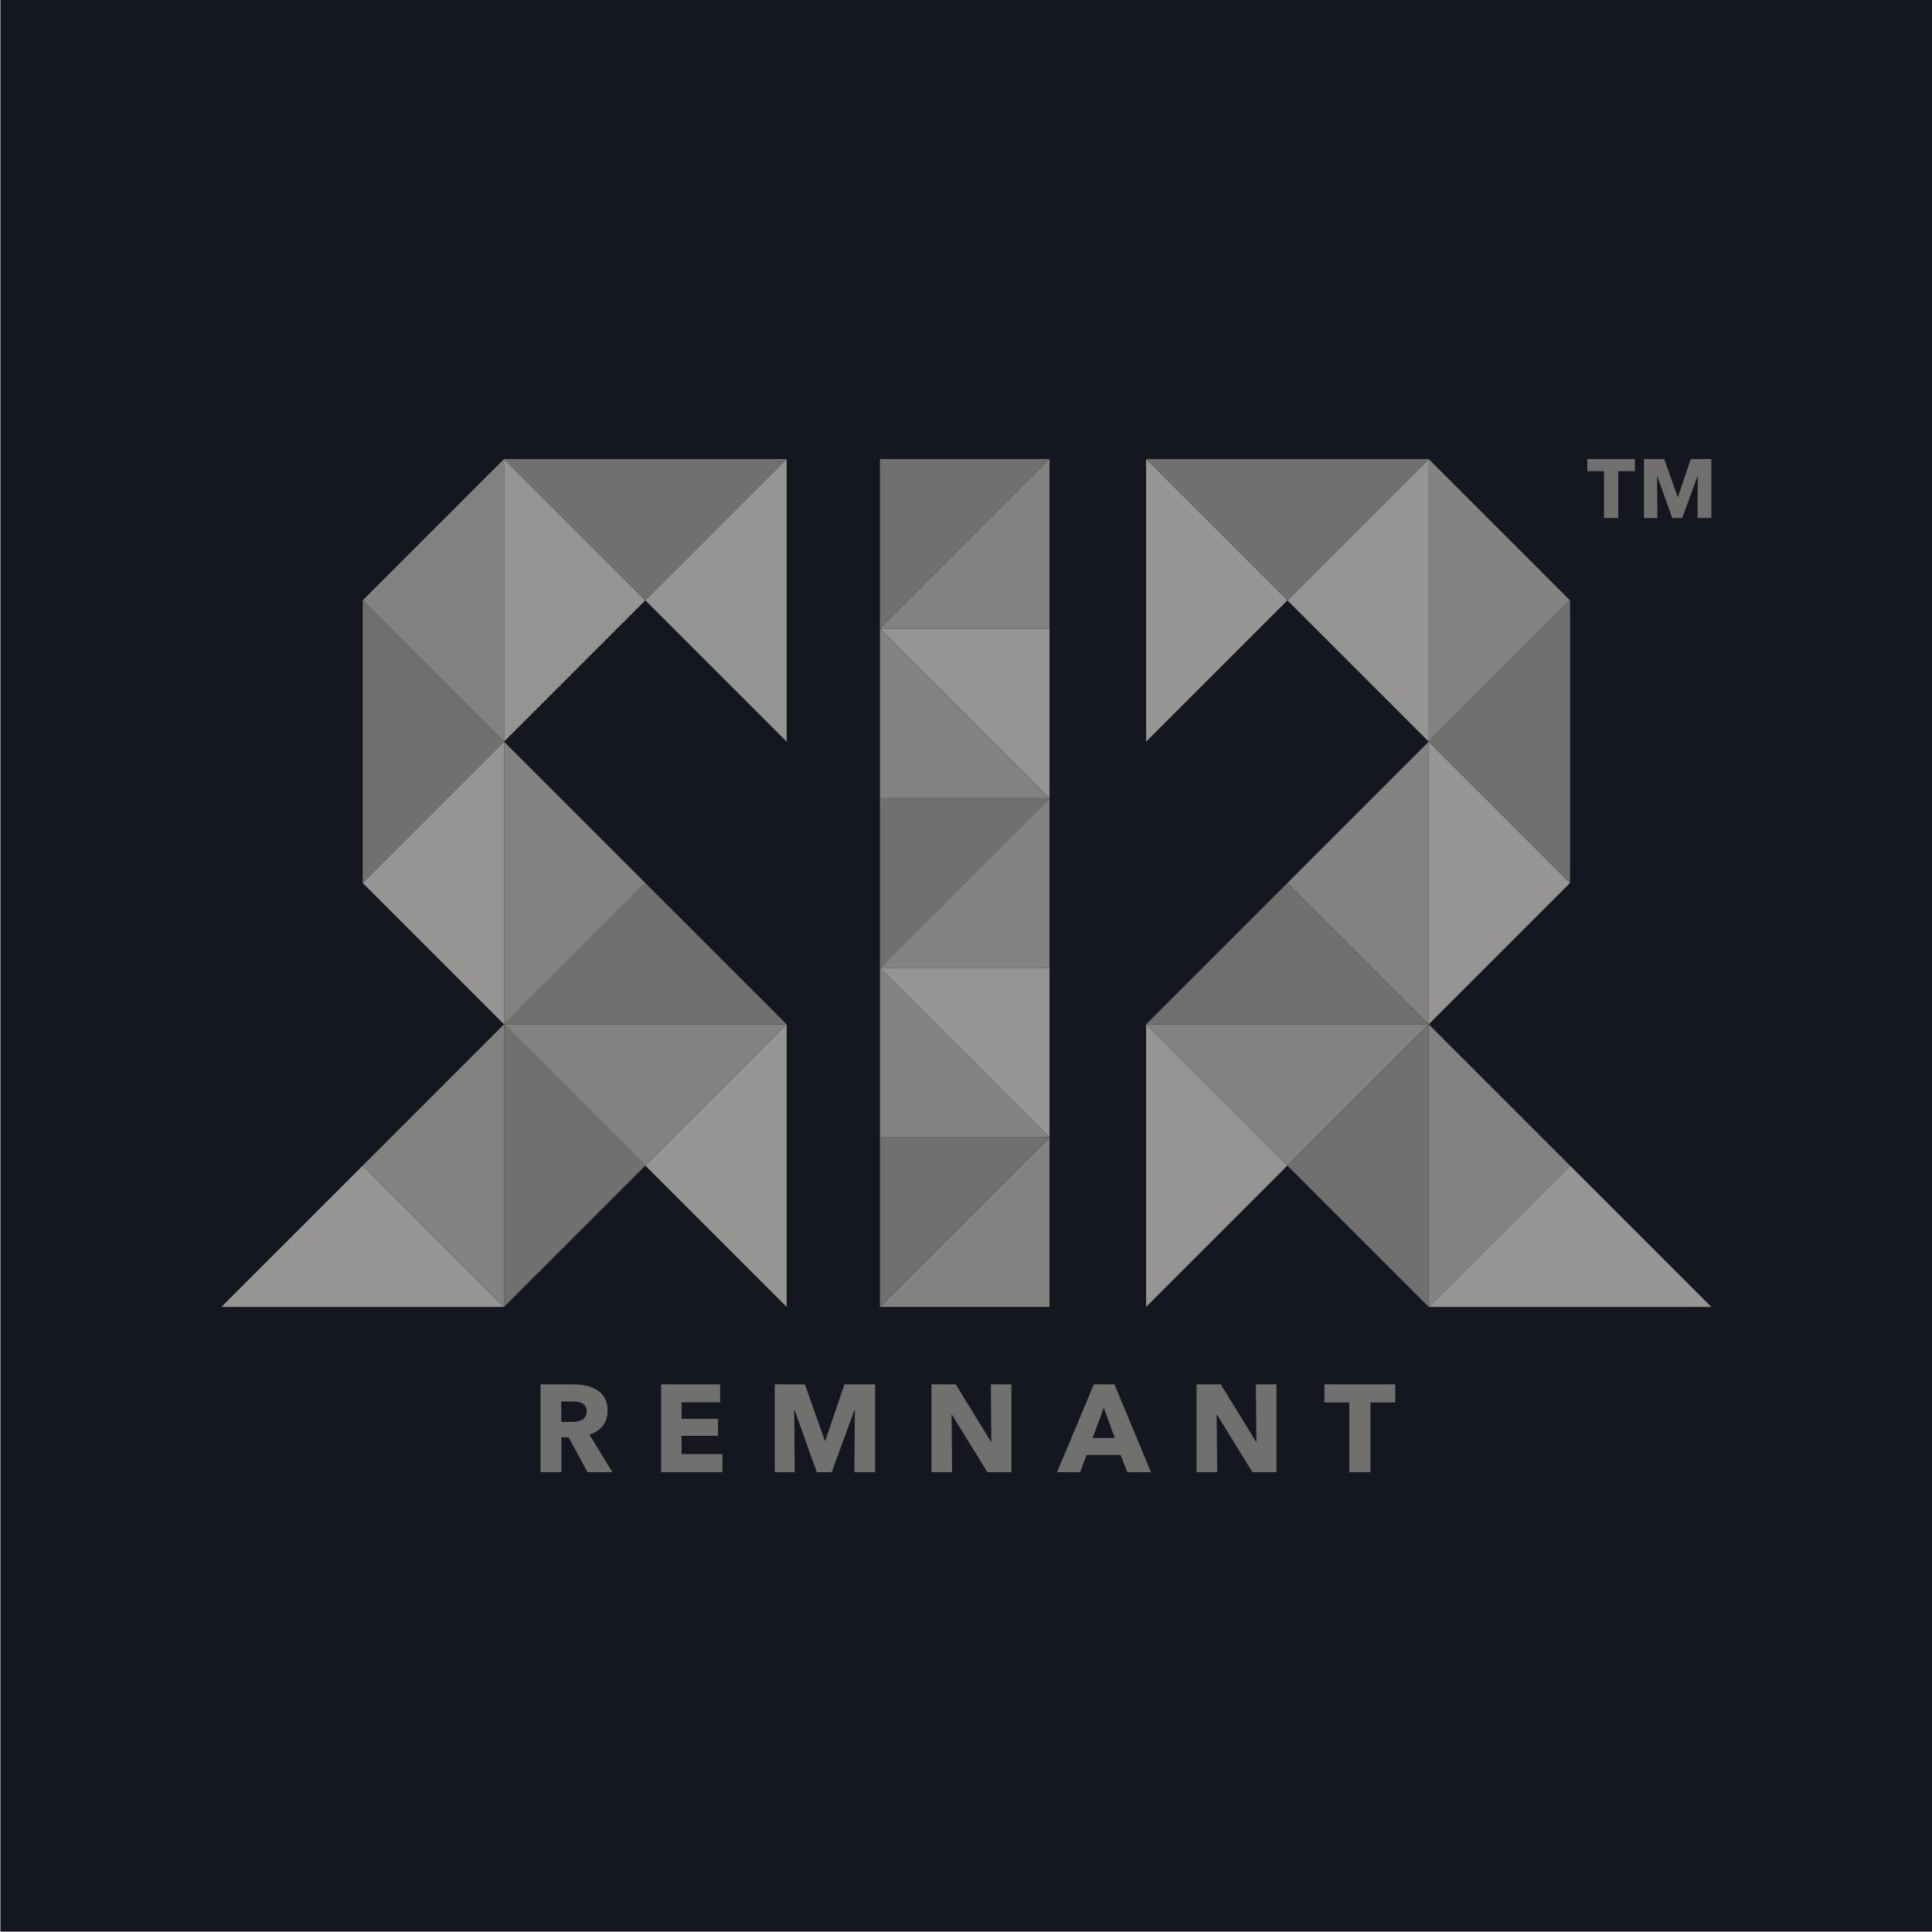 Remnant Brand Logo